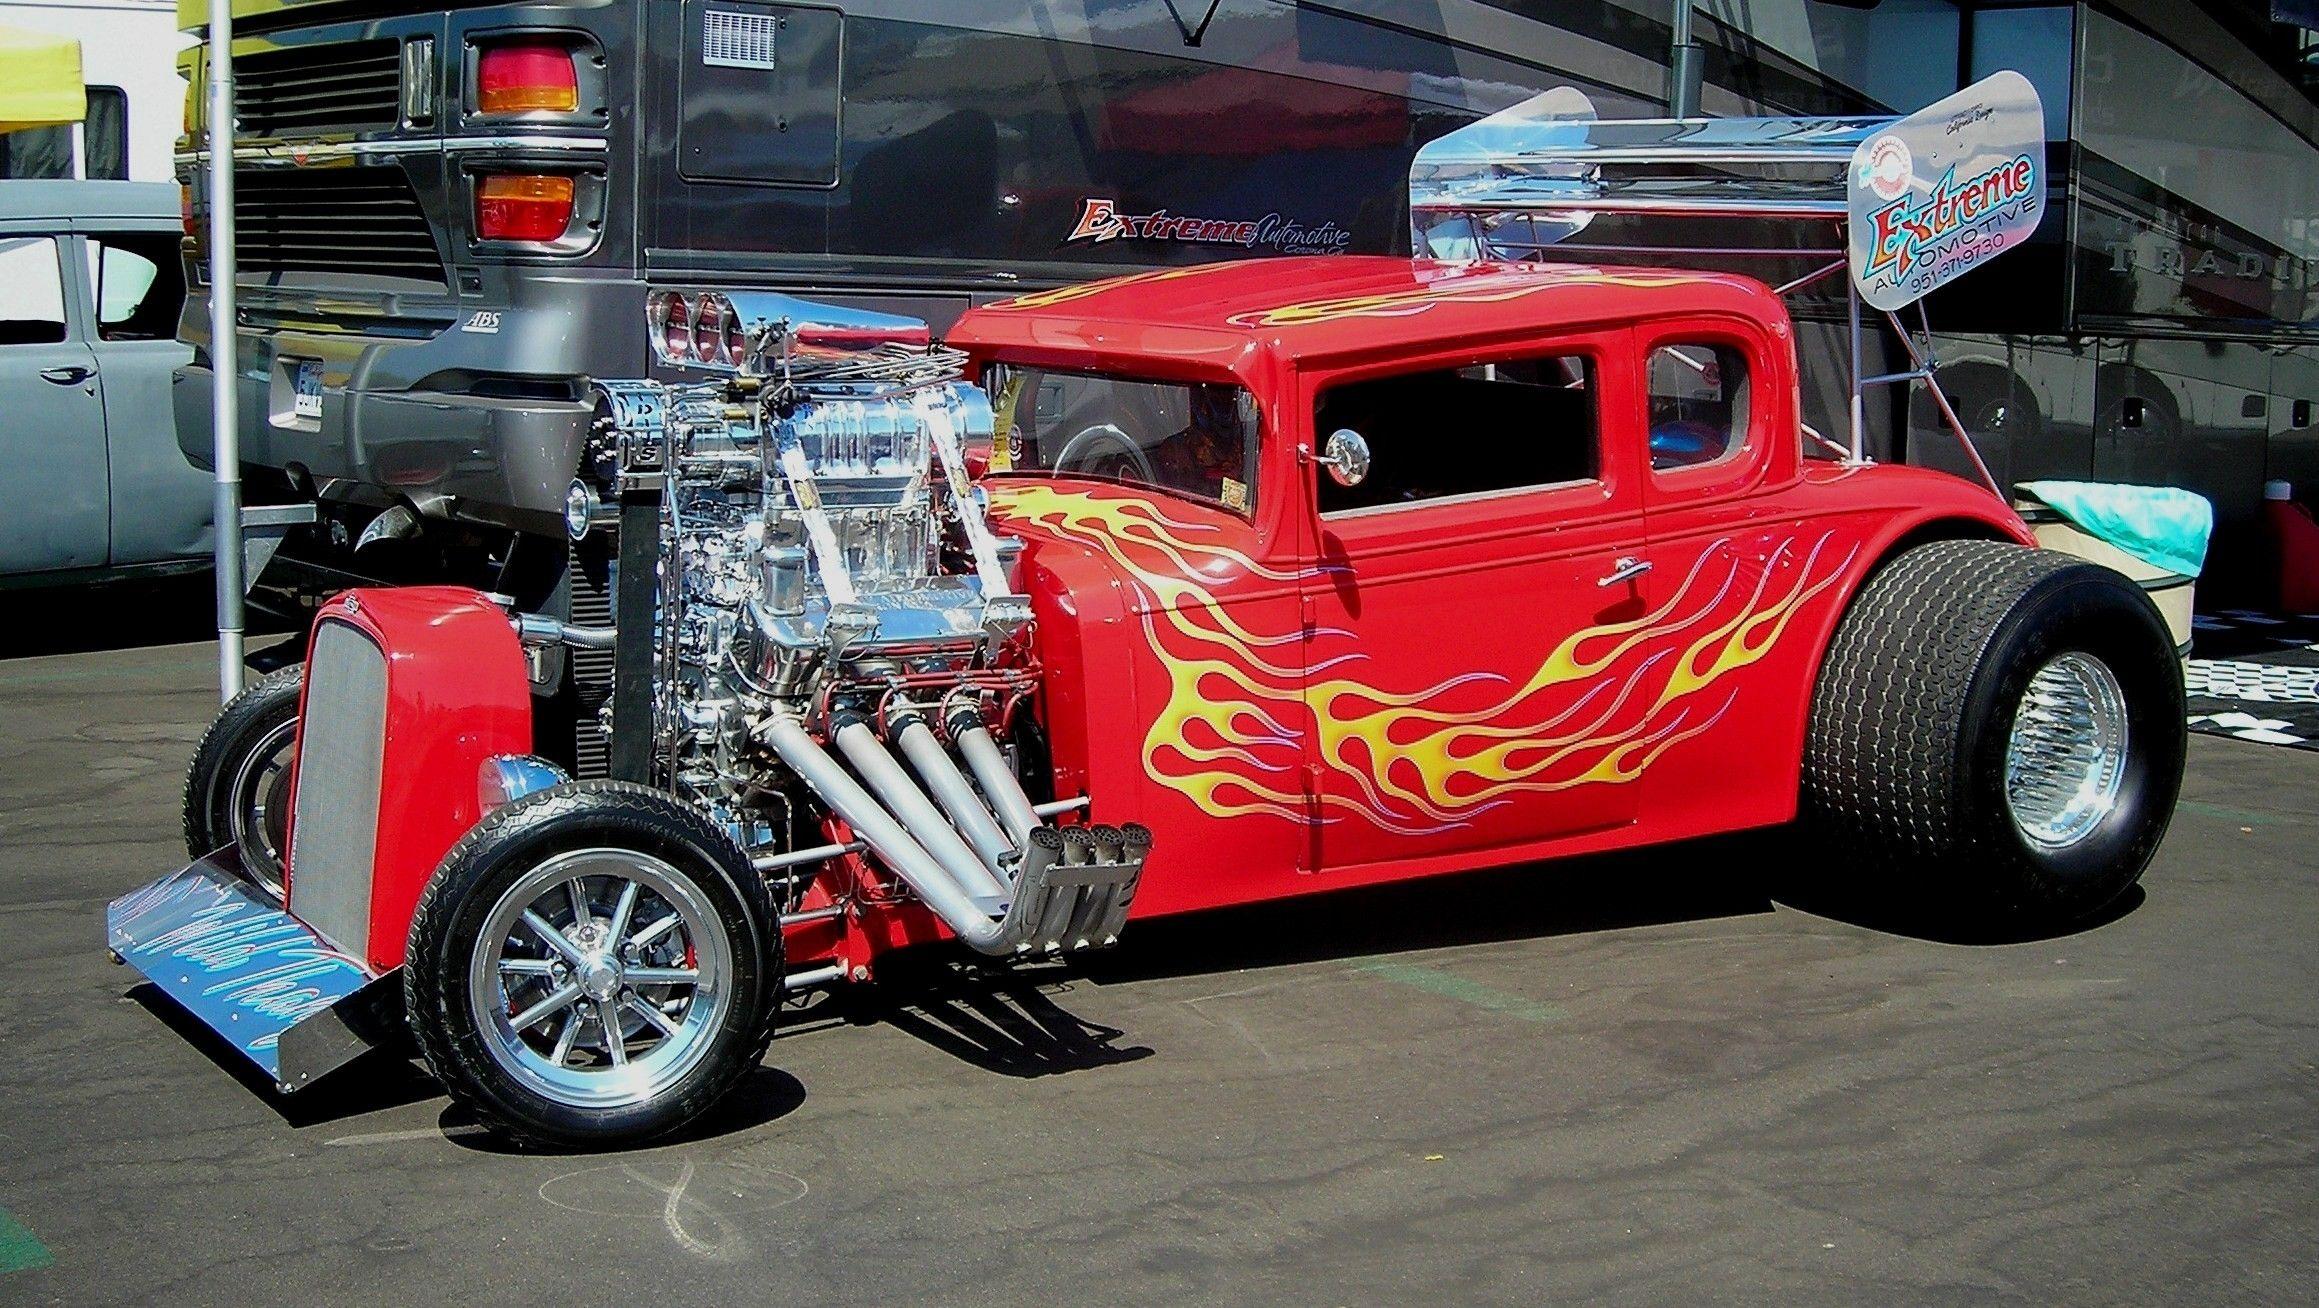 Cars Custom Vehicles Cars Custom Engine Chrome Hot Rod Classic